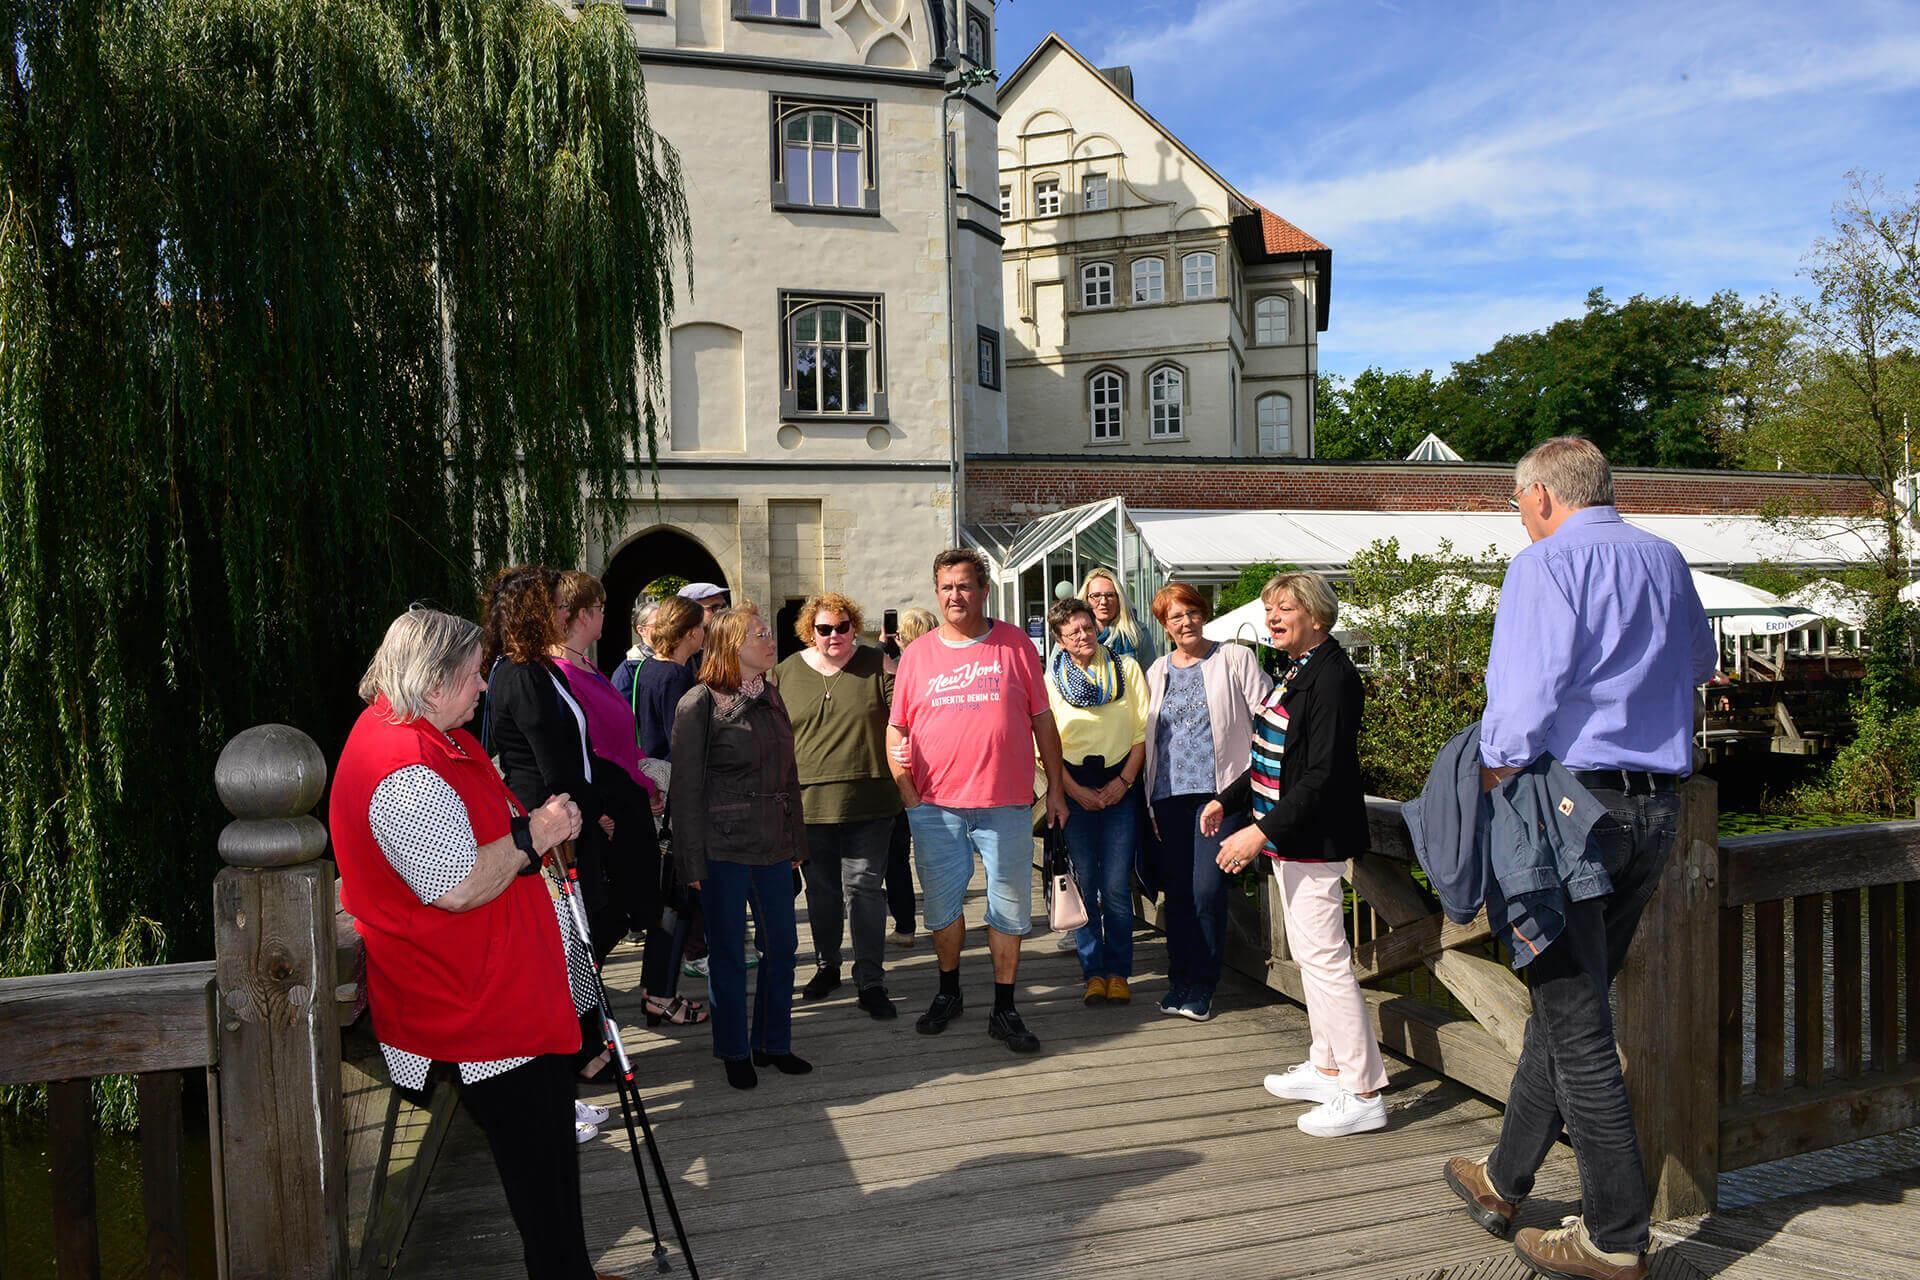 Gruppe vor dem Gifhorner Schloss